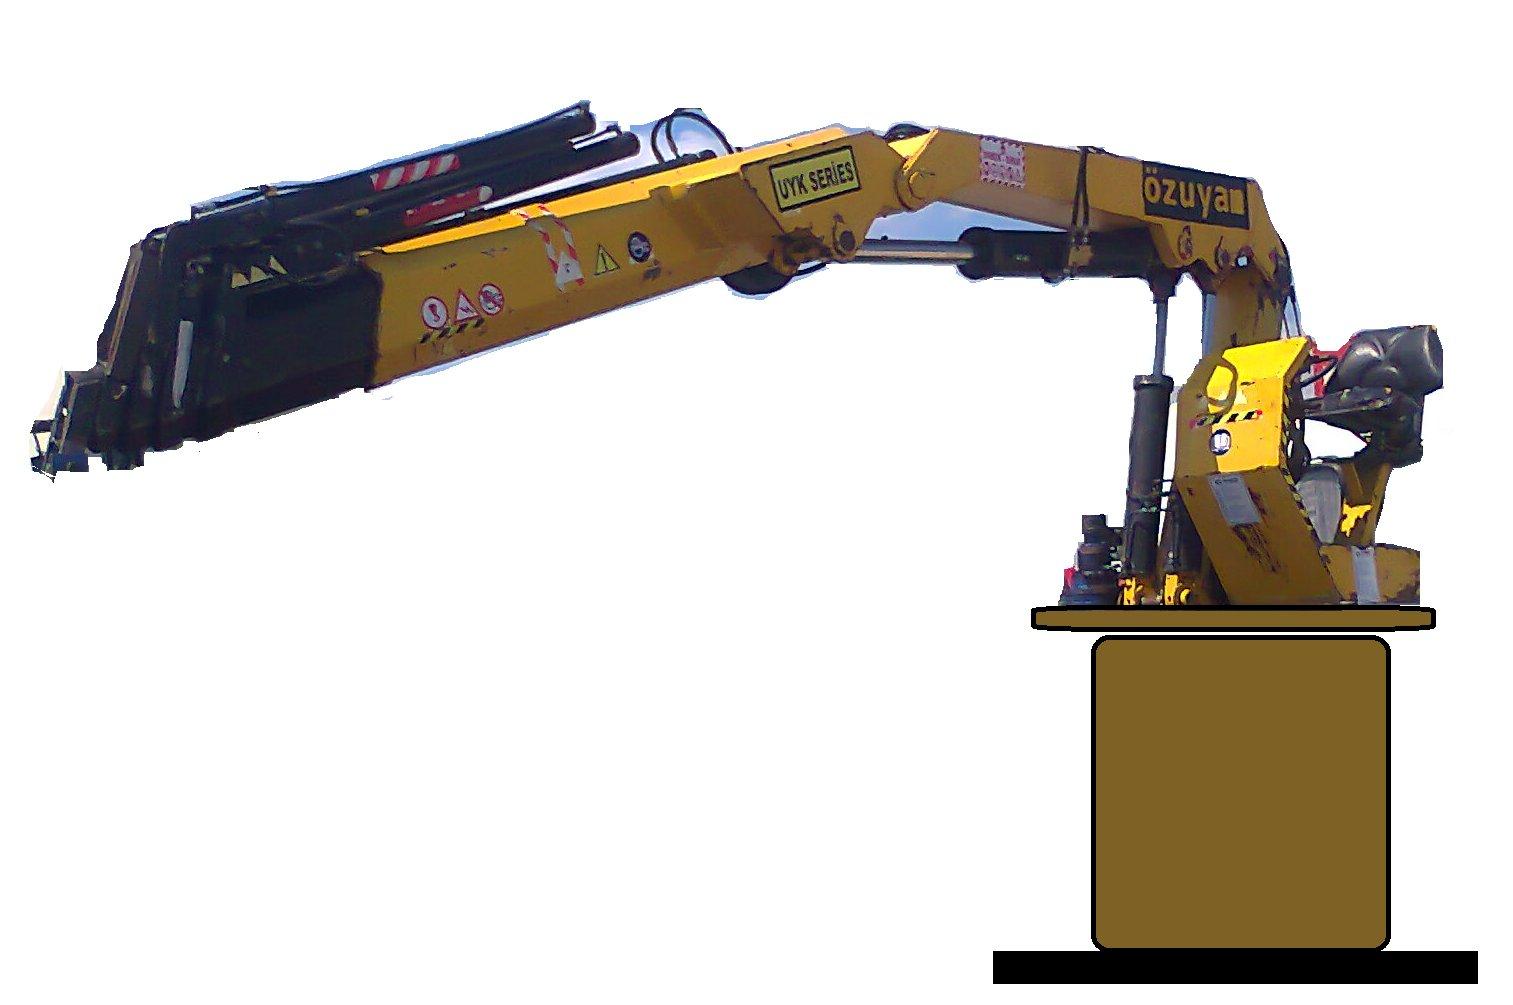 puma-marine-crane35127.jpg